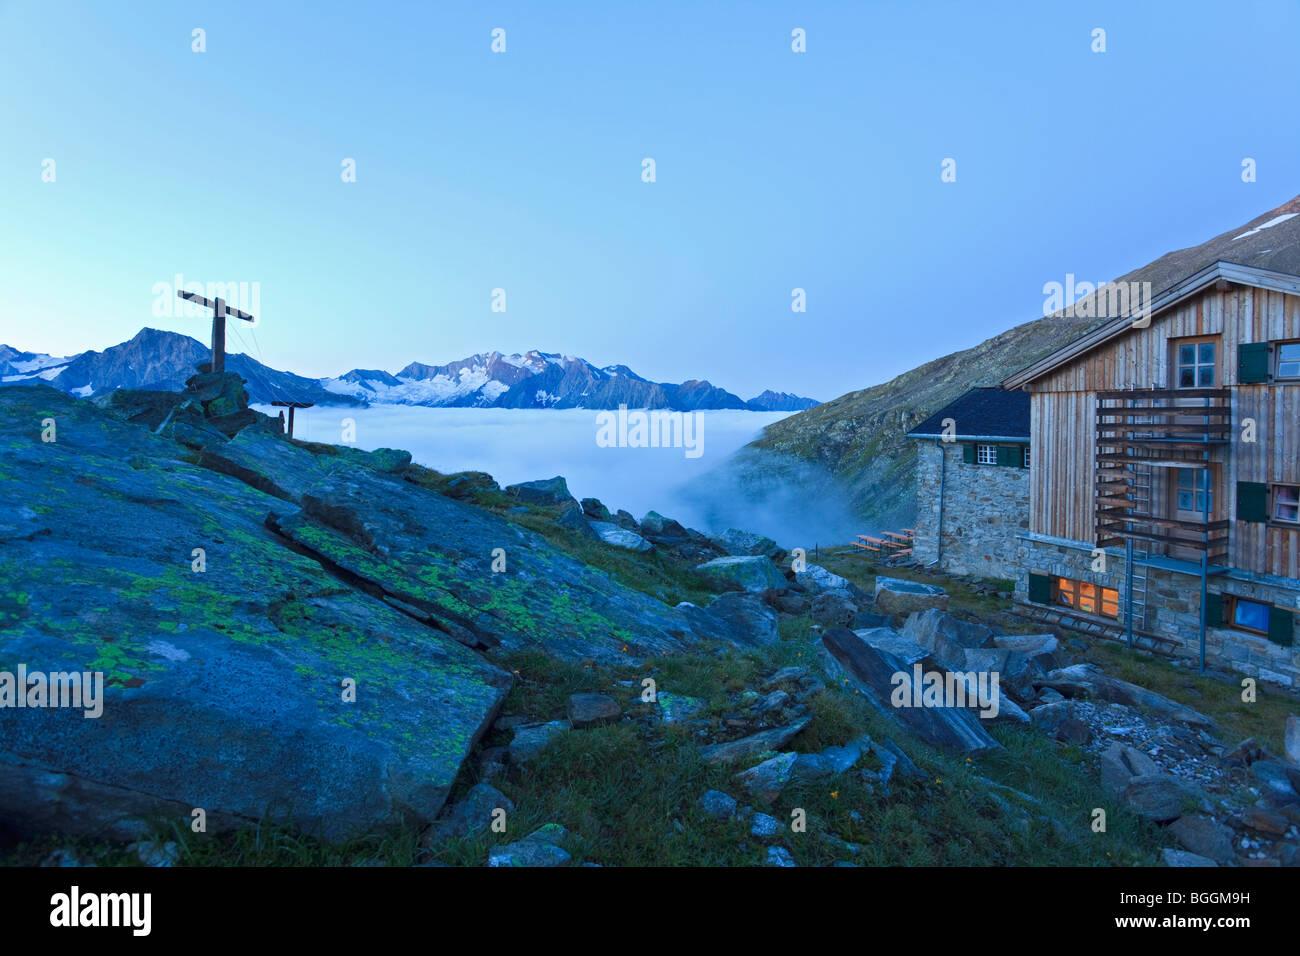 Refuge in Tyrol, Austria - Stock Image